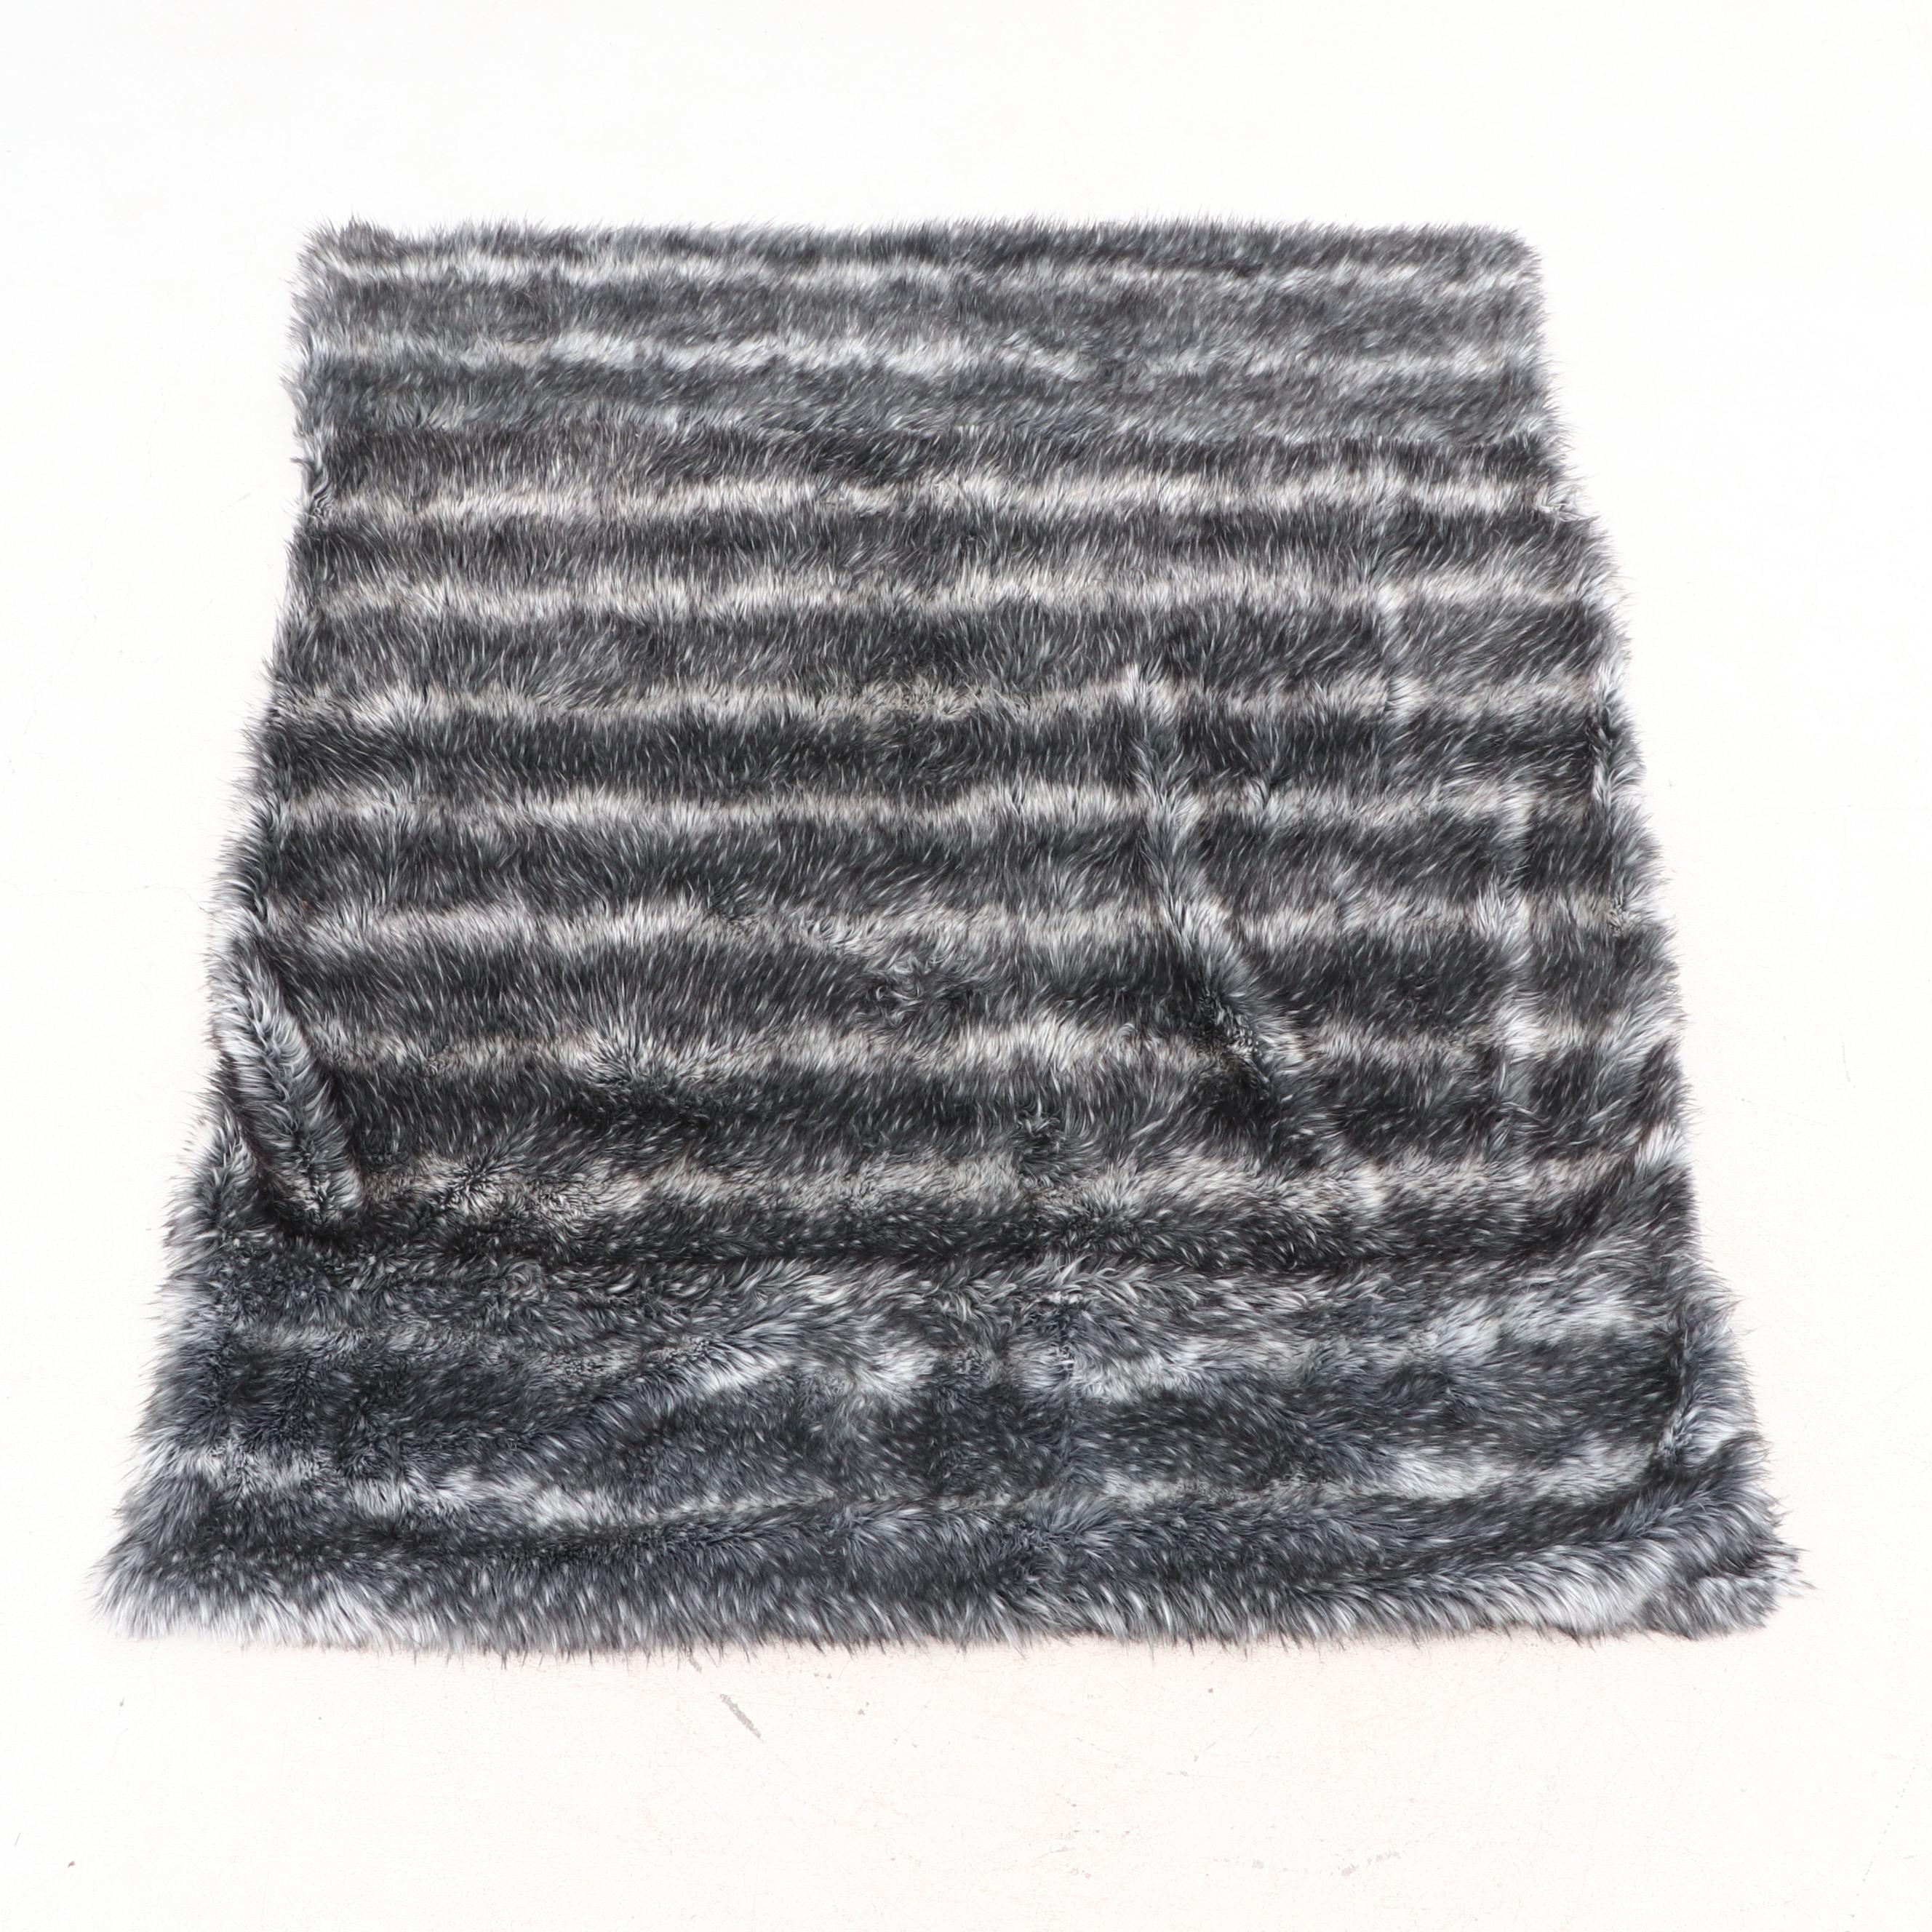 Restoration Hardware Faux Fur King Sized Throw